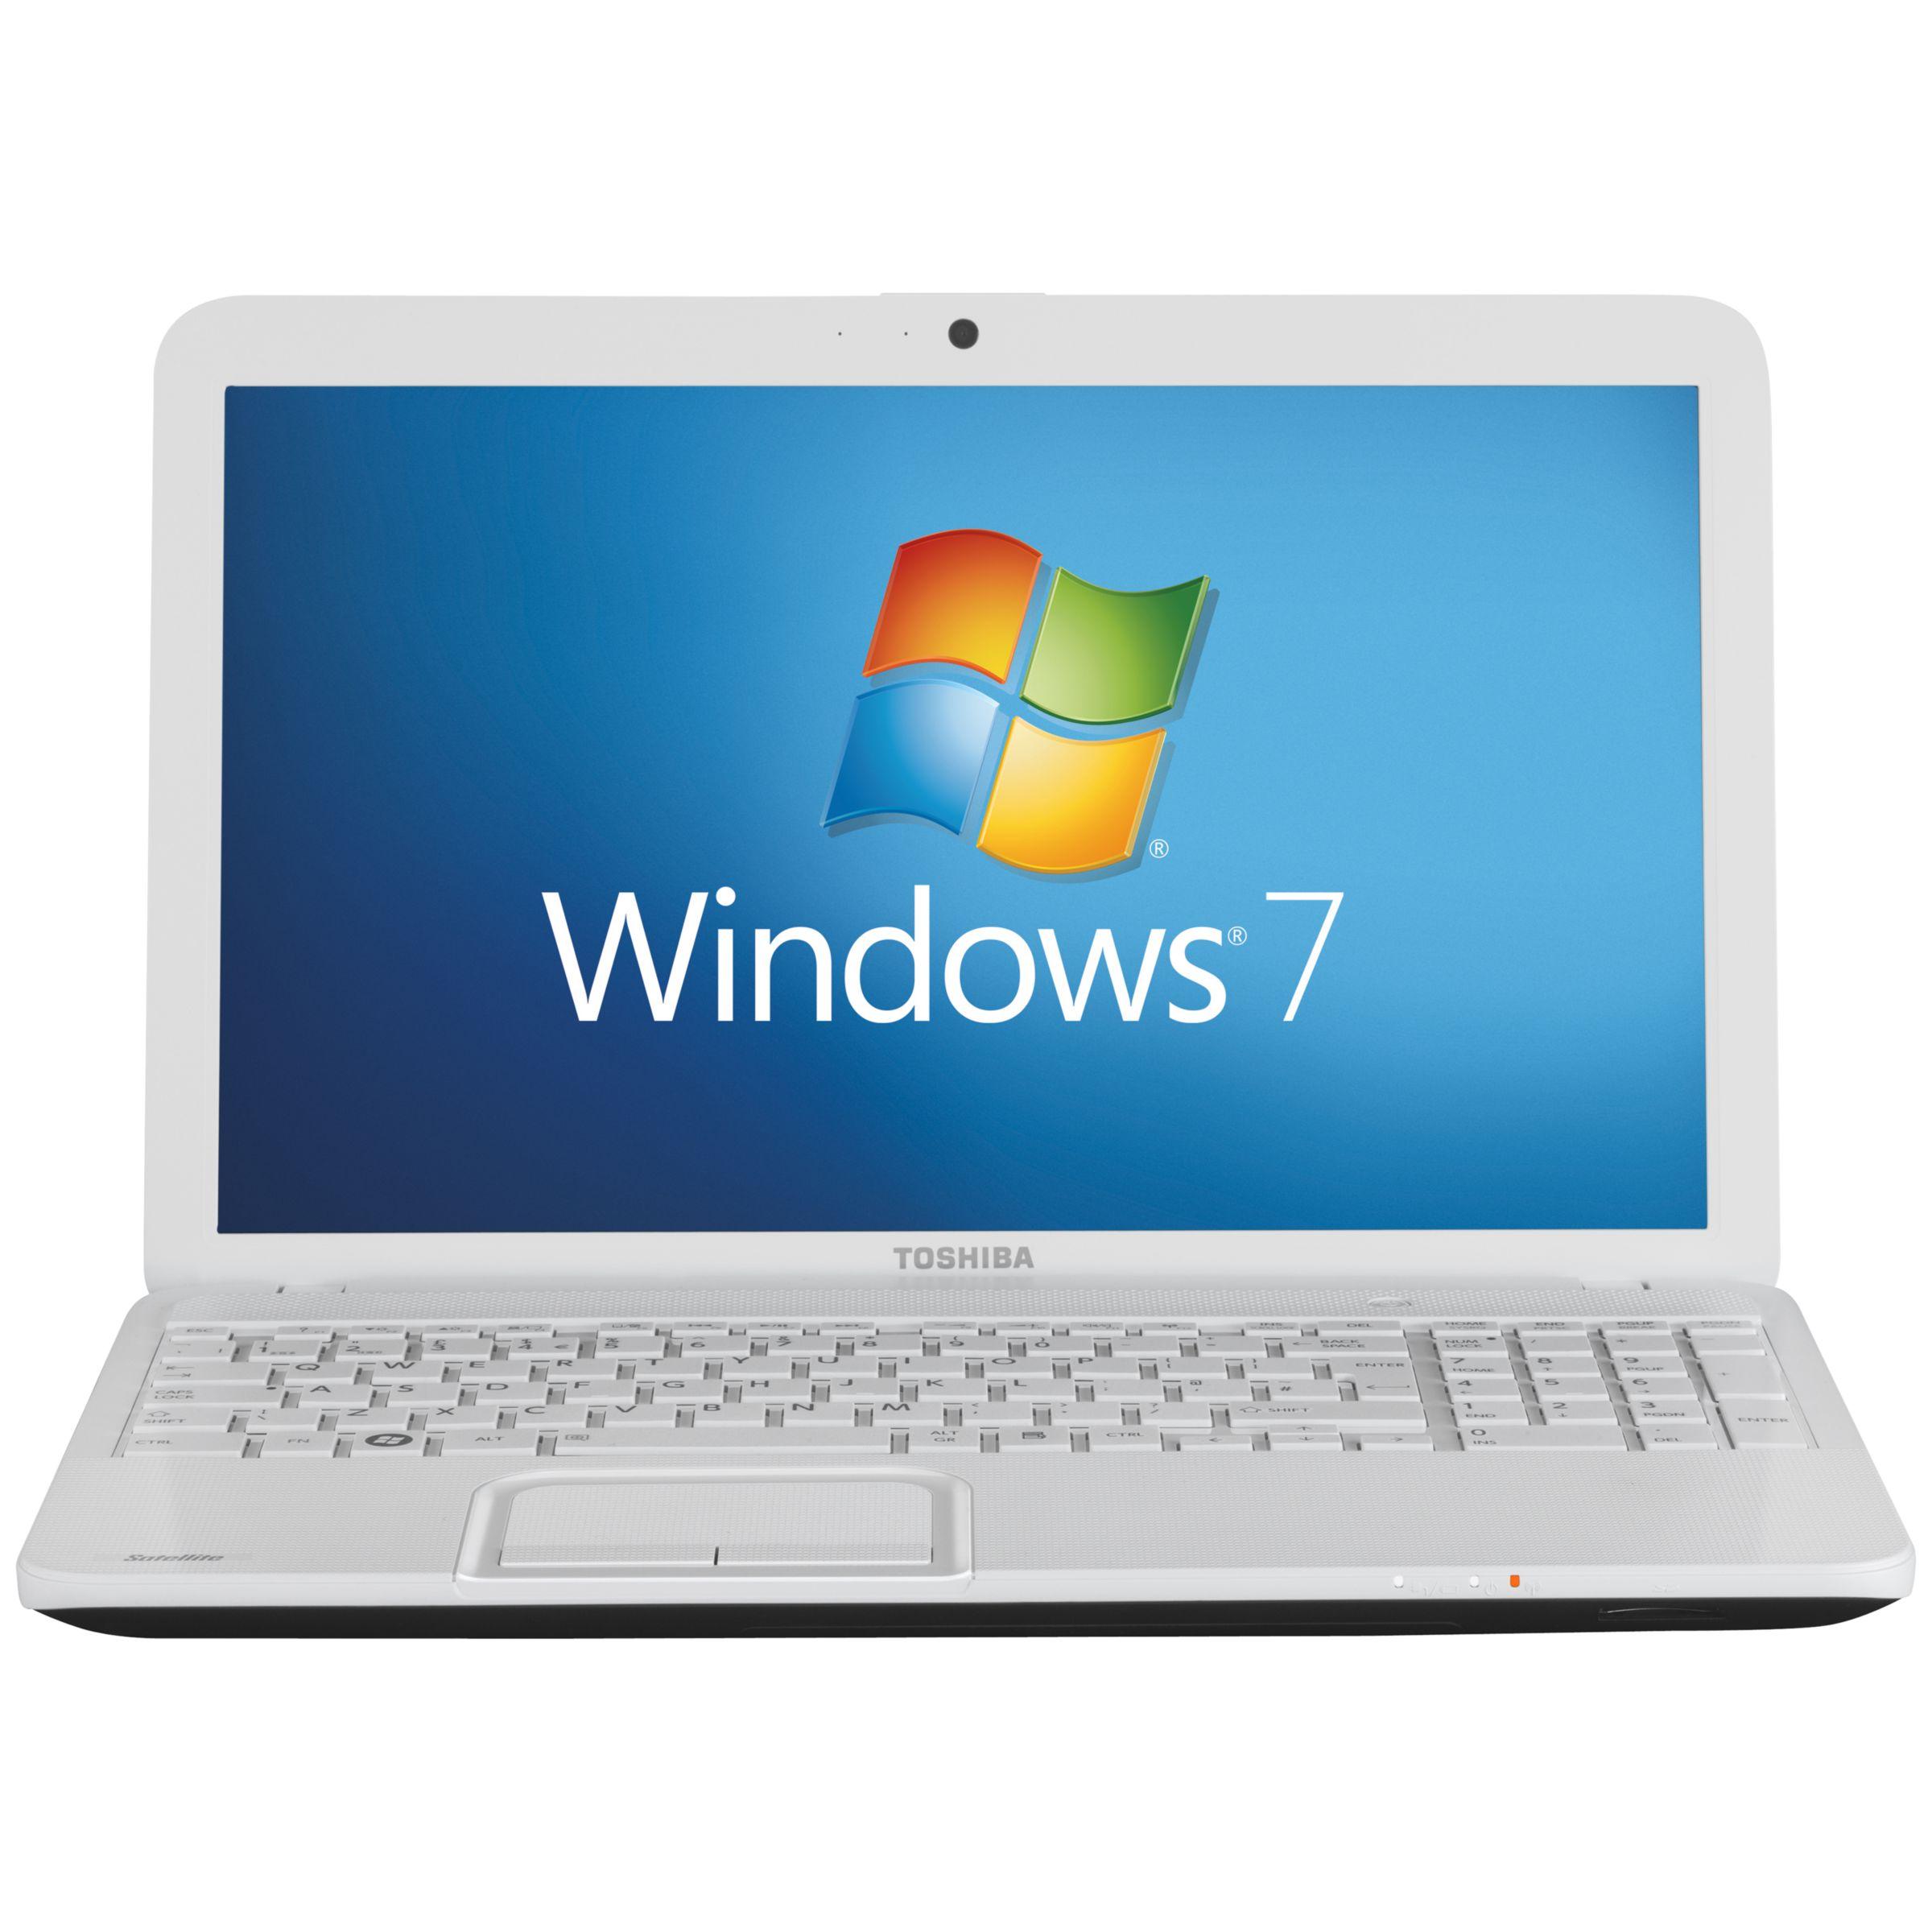 "Toshiba Satellite C855 Laptop, Intel Pentium B960, 2.2ghz, 6gb Ram, 640gb, 15.6"", White"